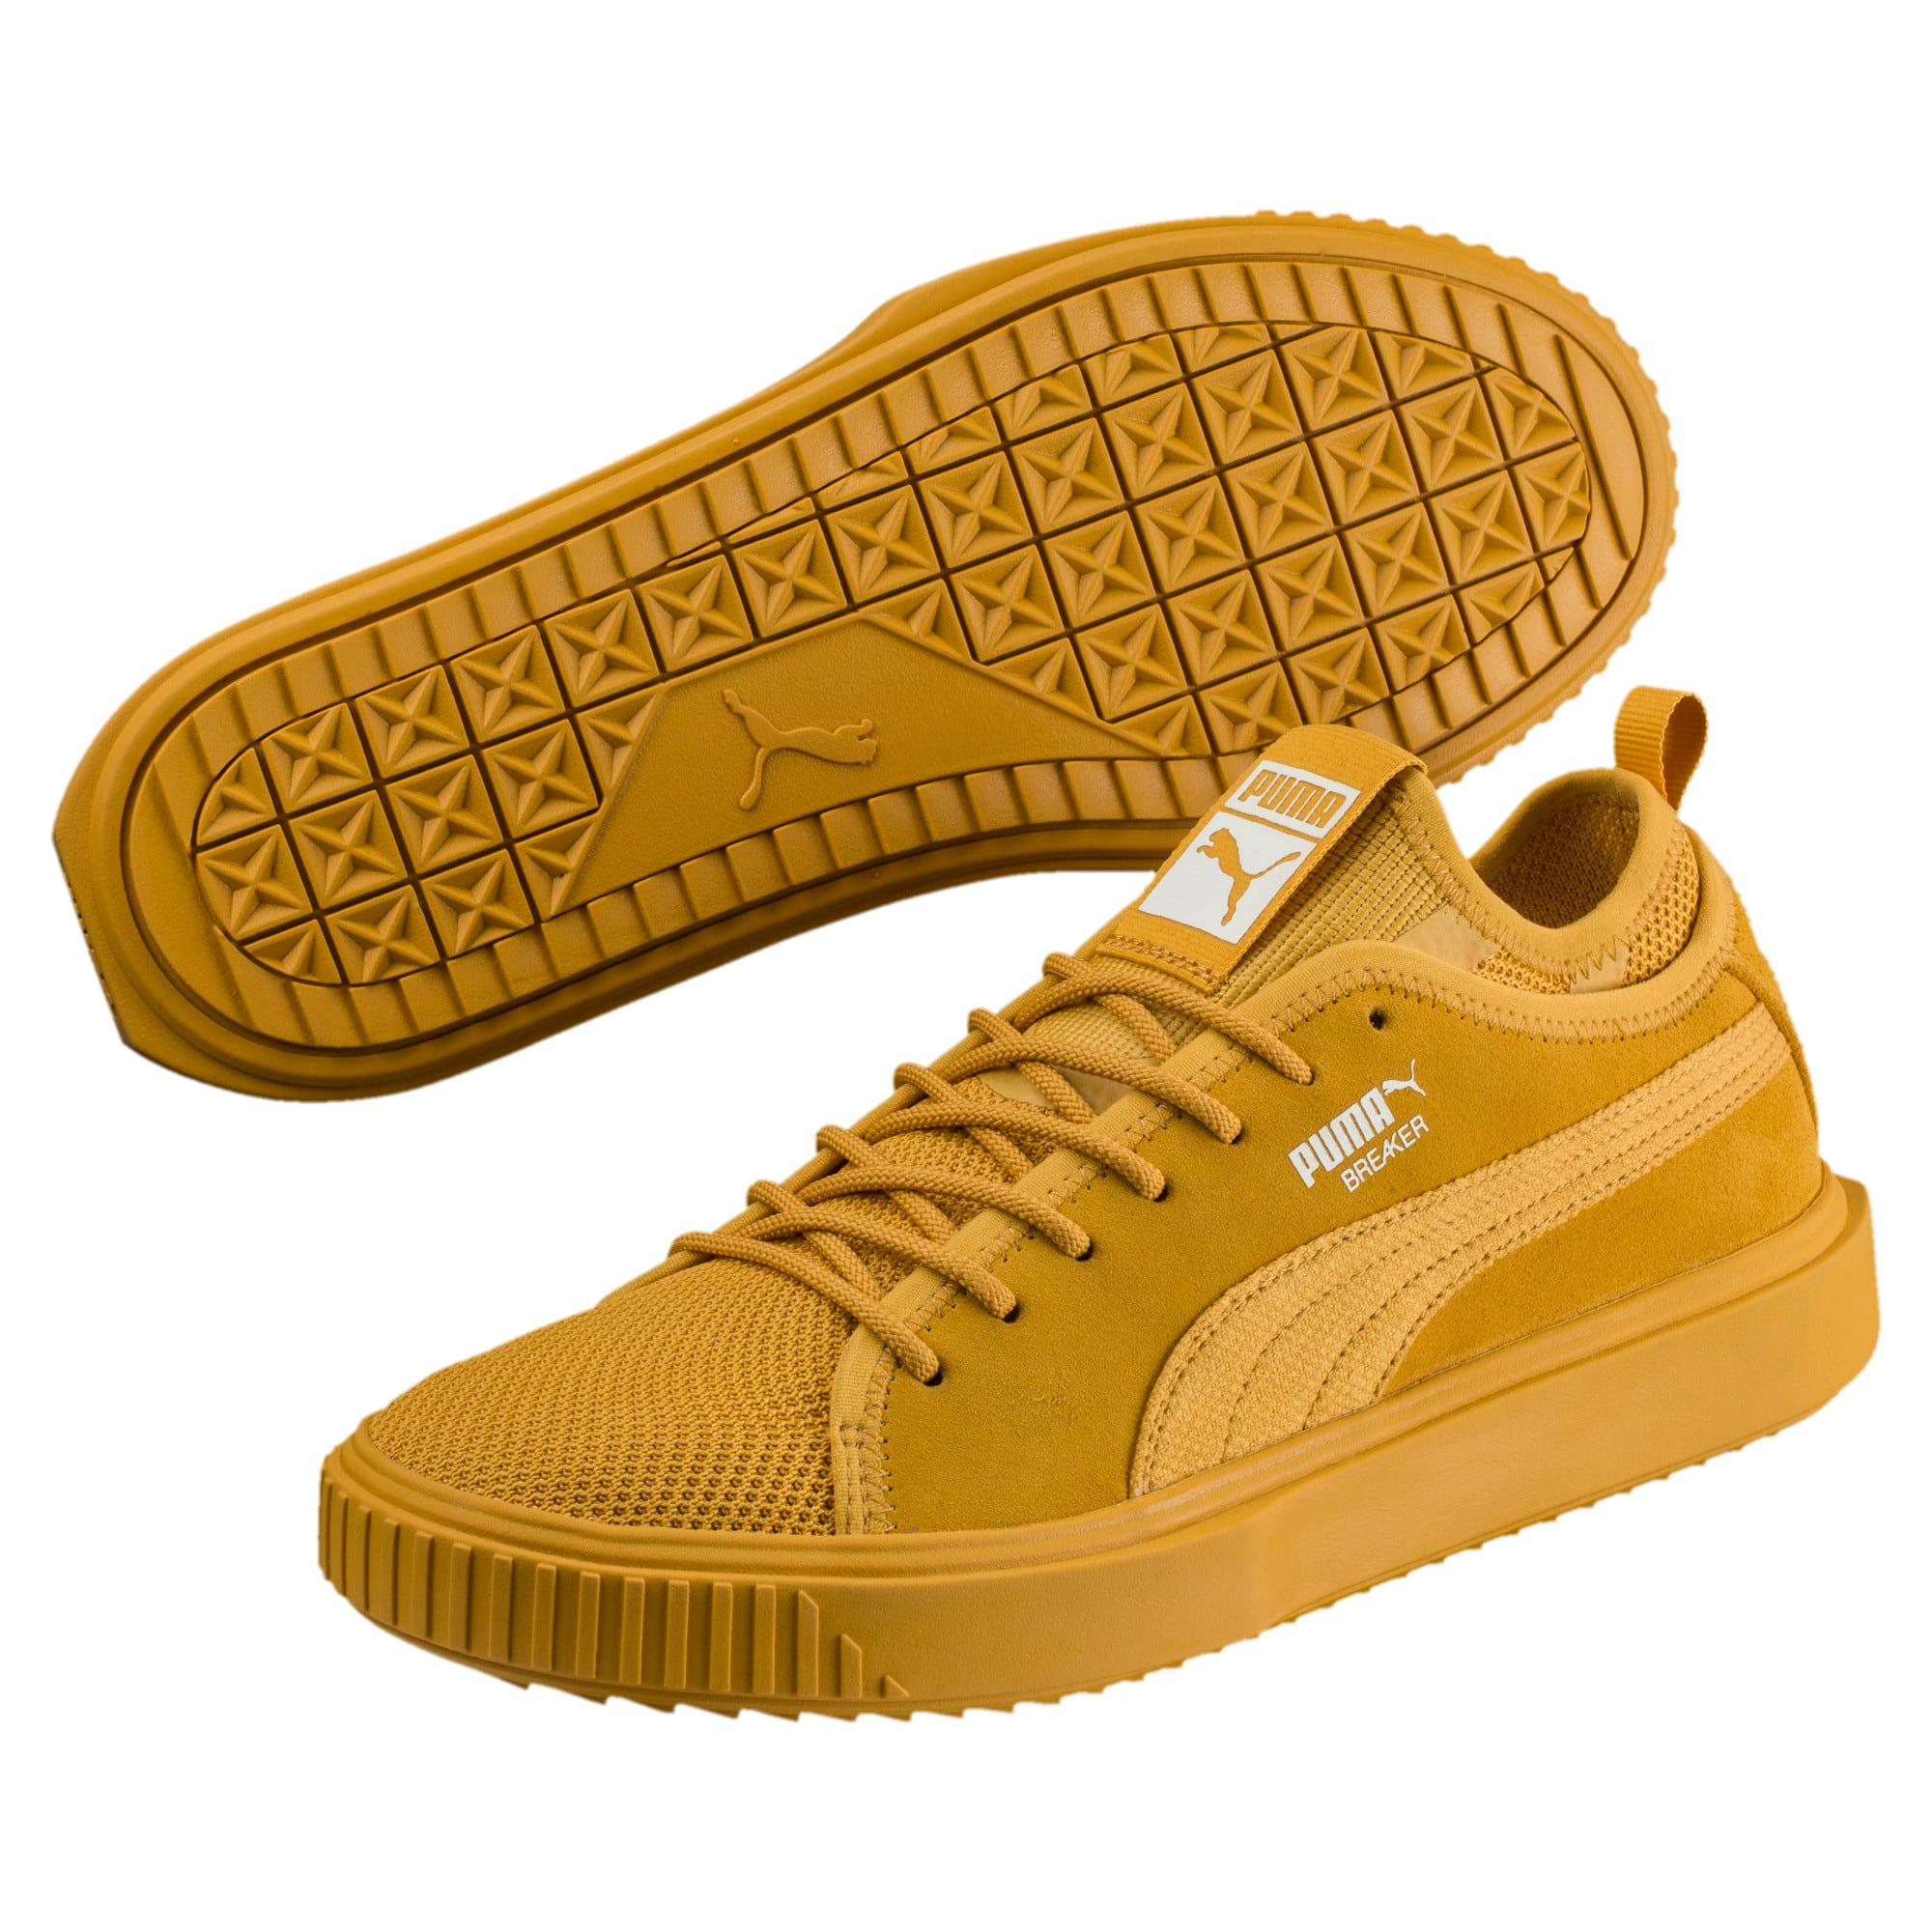 Thumbnail 2 of Breaker Mesh Men's Sneakers, Mineral Yellow-Minl Yellow, medium